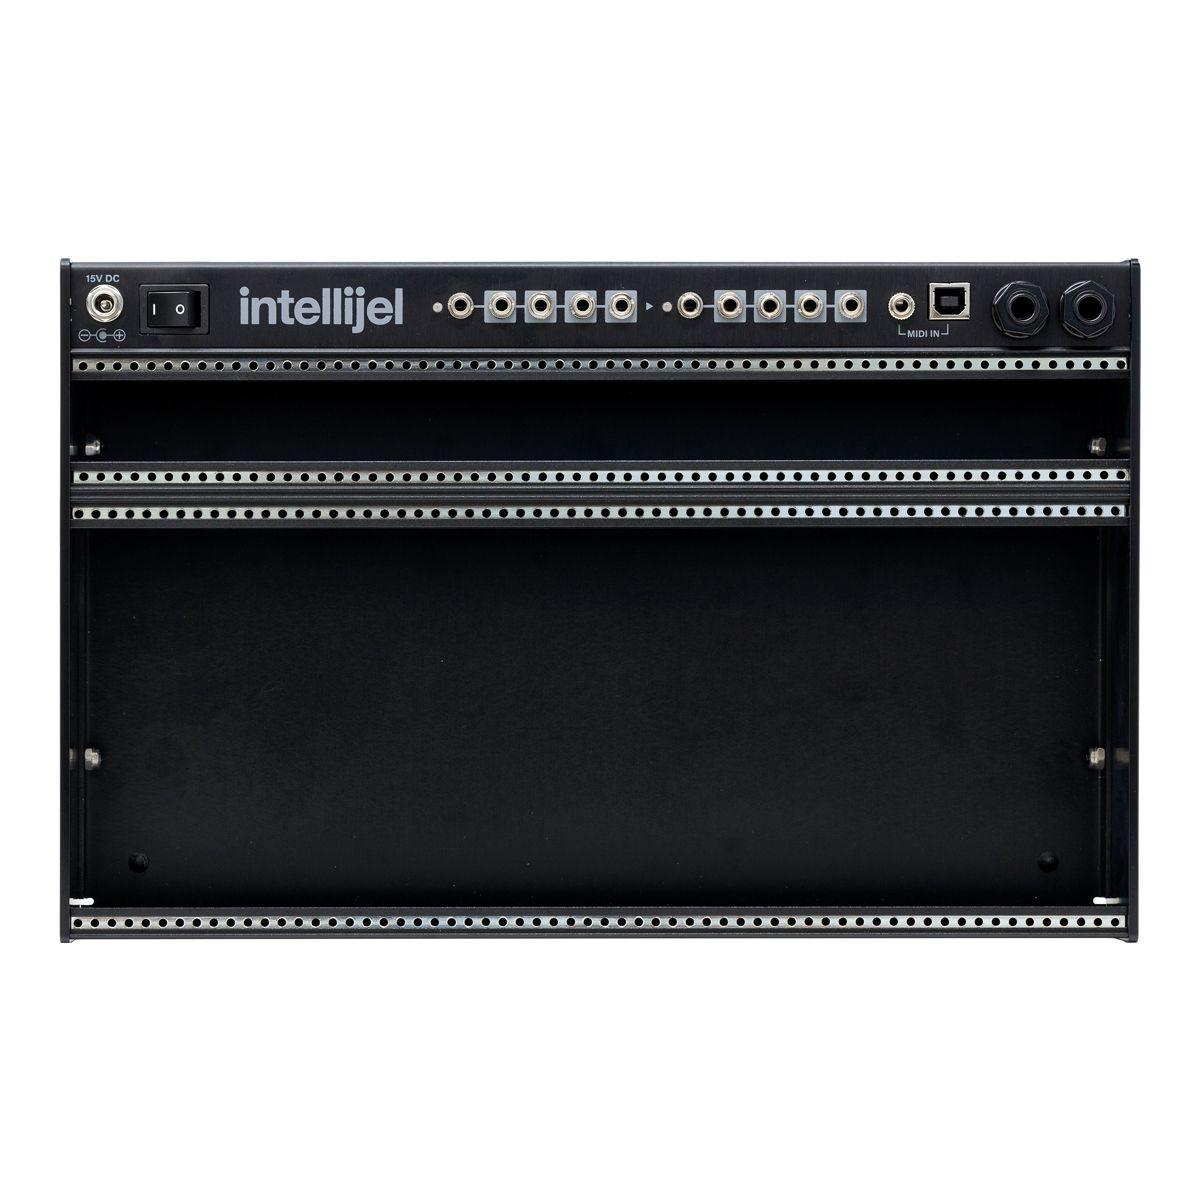 Intellijel Palette Eurorack Powered Case (4U - 62hp) - Black